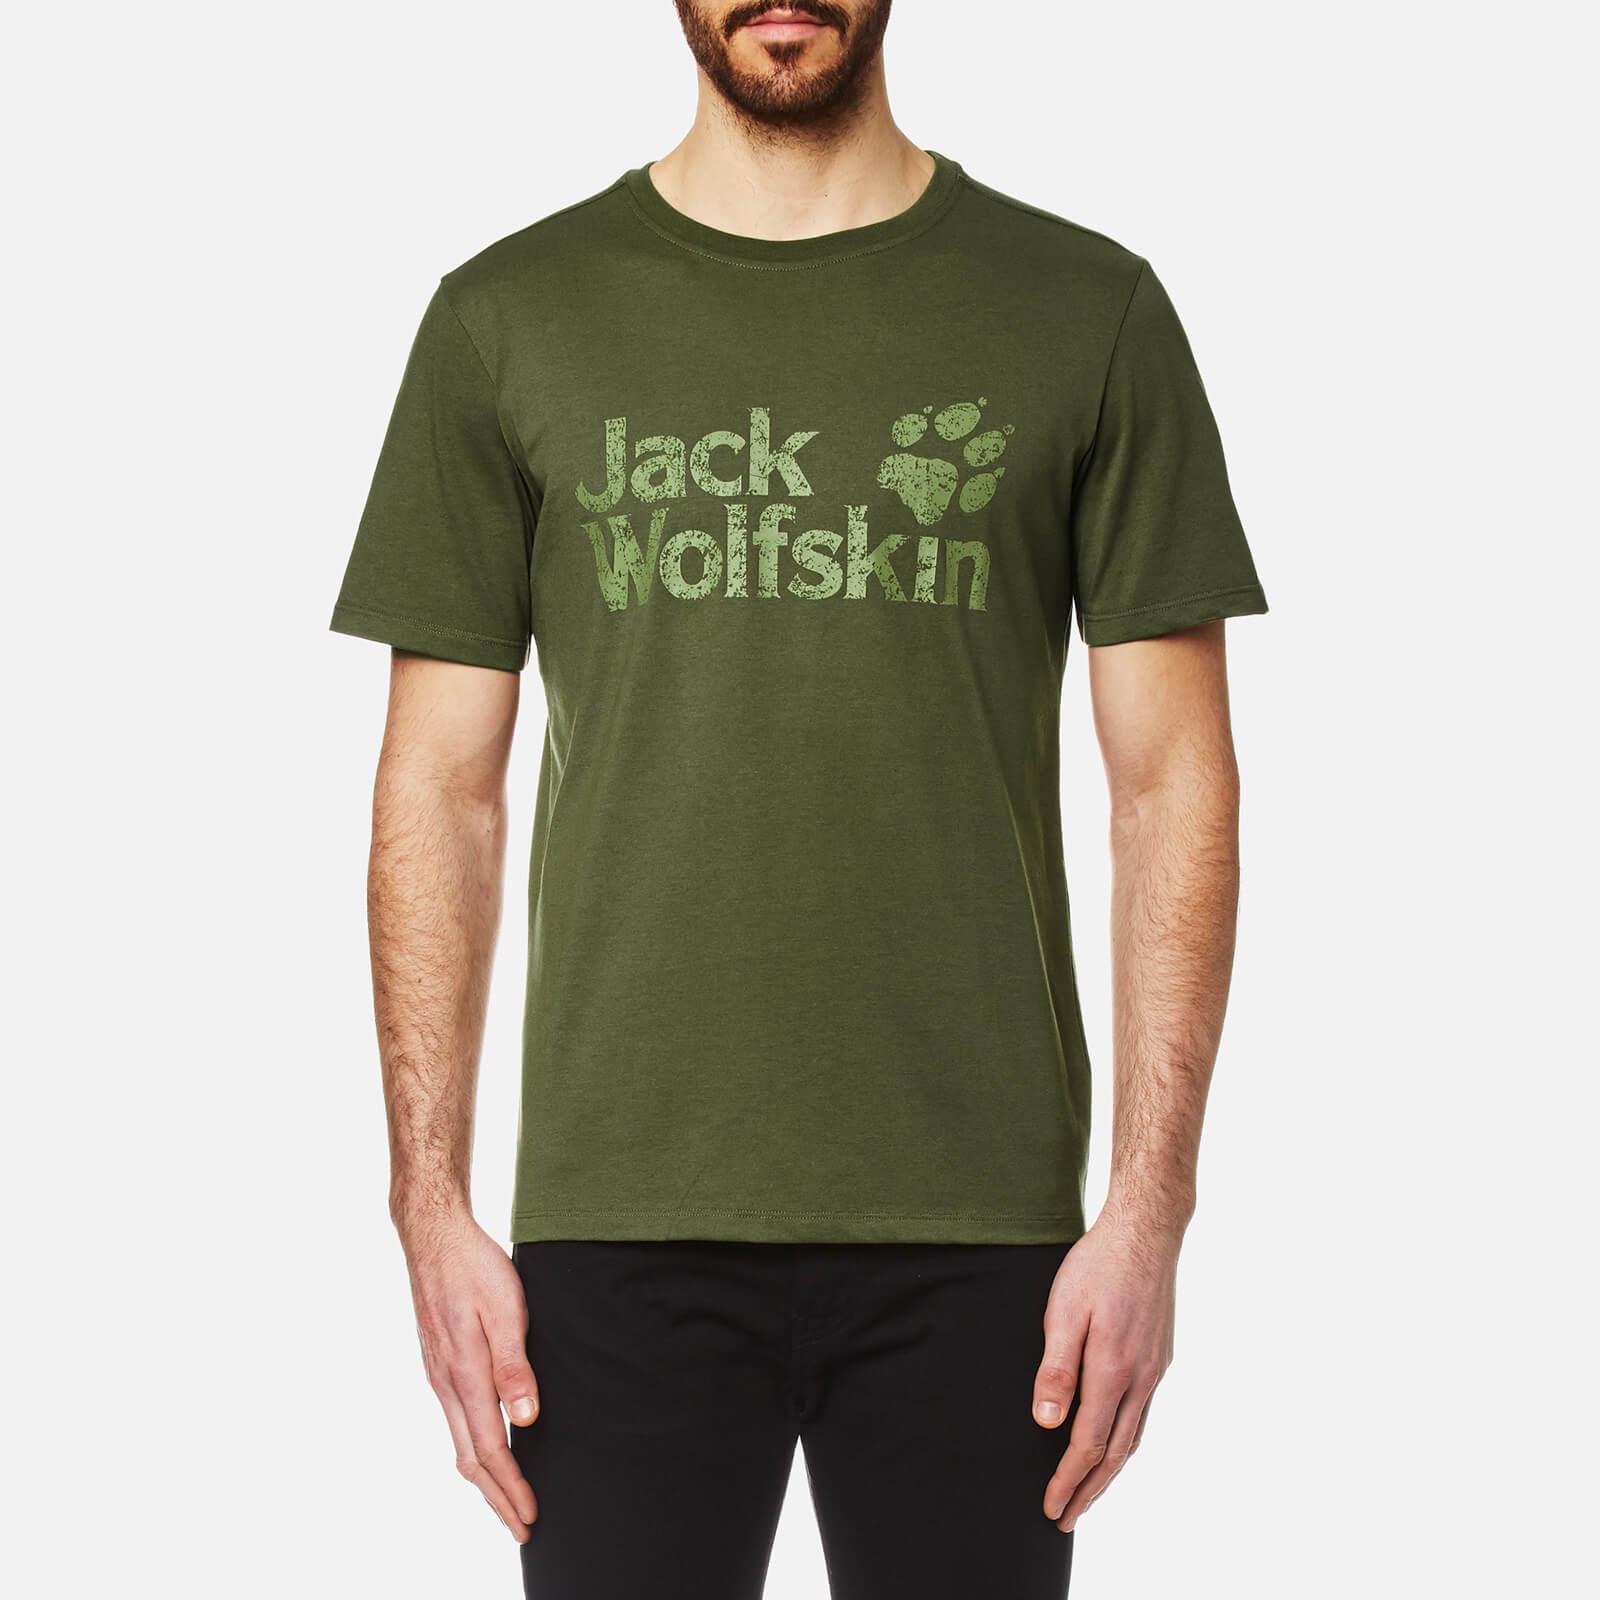 45eccab0465 Jack Wolfskin Men's Pride Function 65 T-Shirt - Burnt Olive Clothing |  TheHut.com